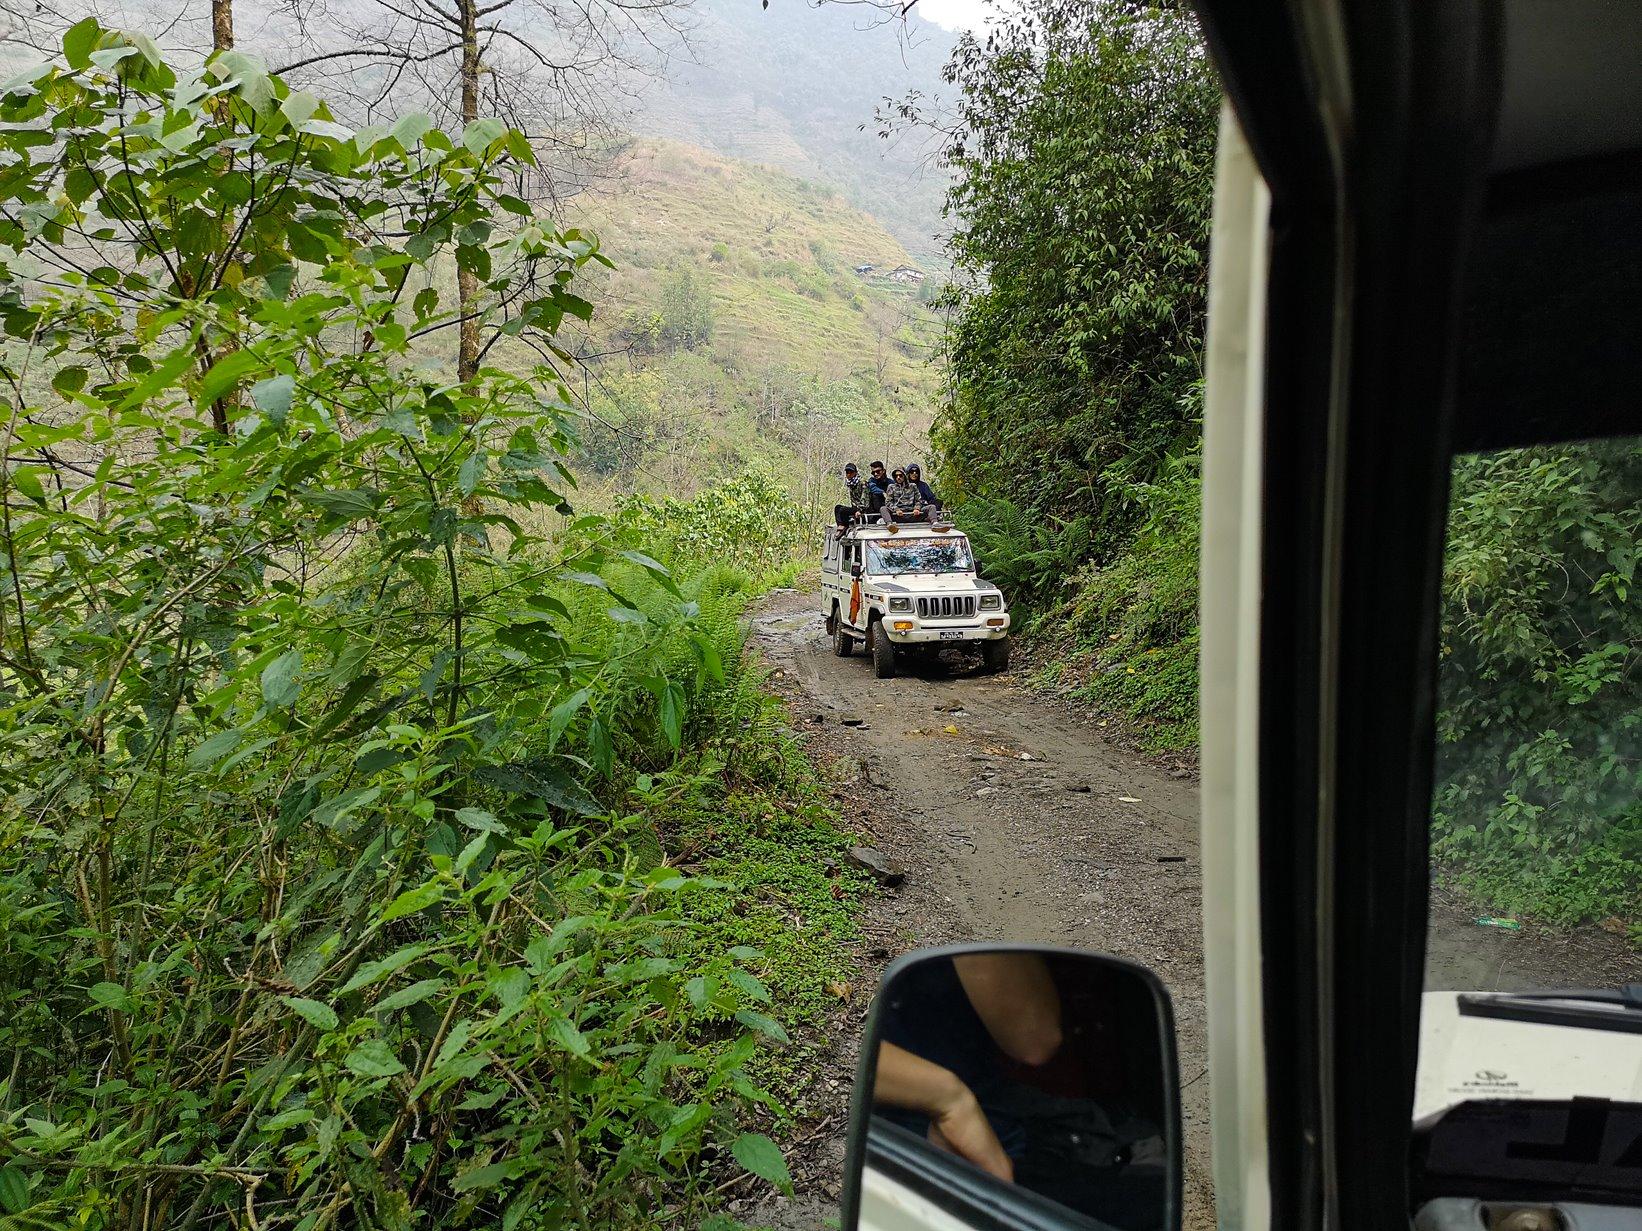 Sidding village to Pokhara